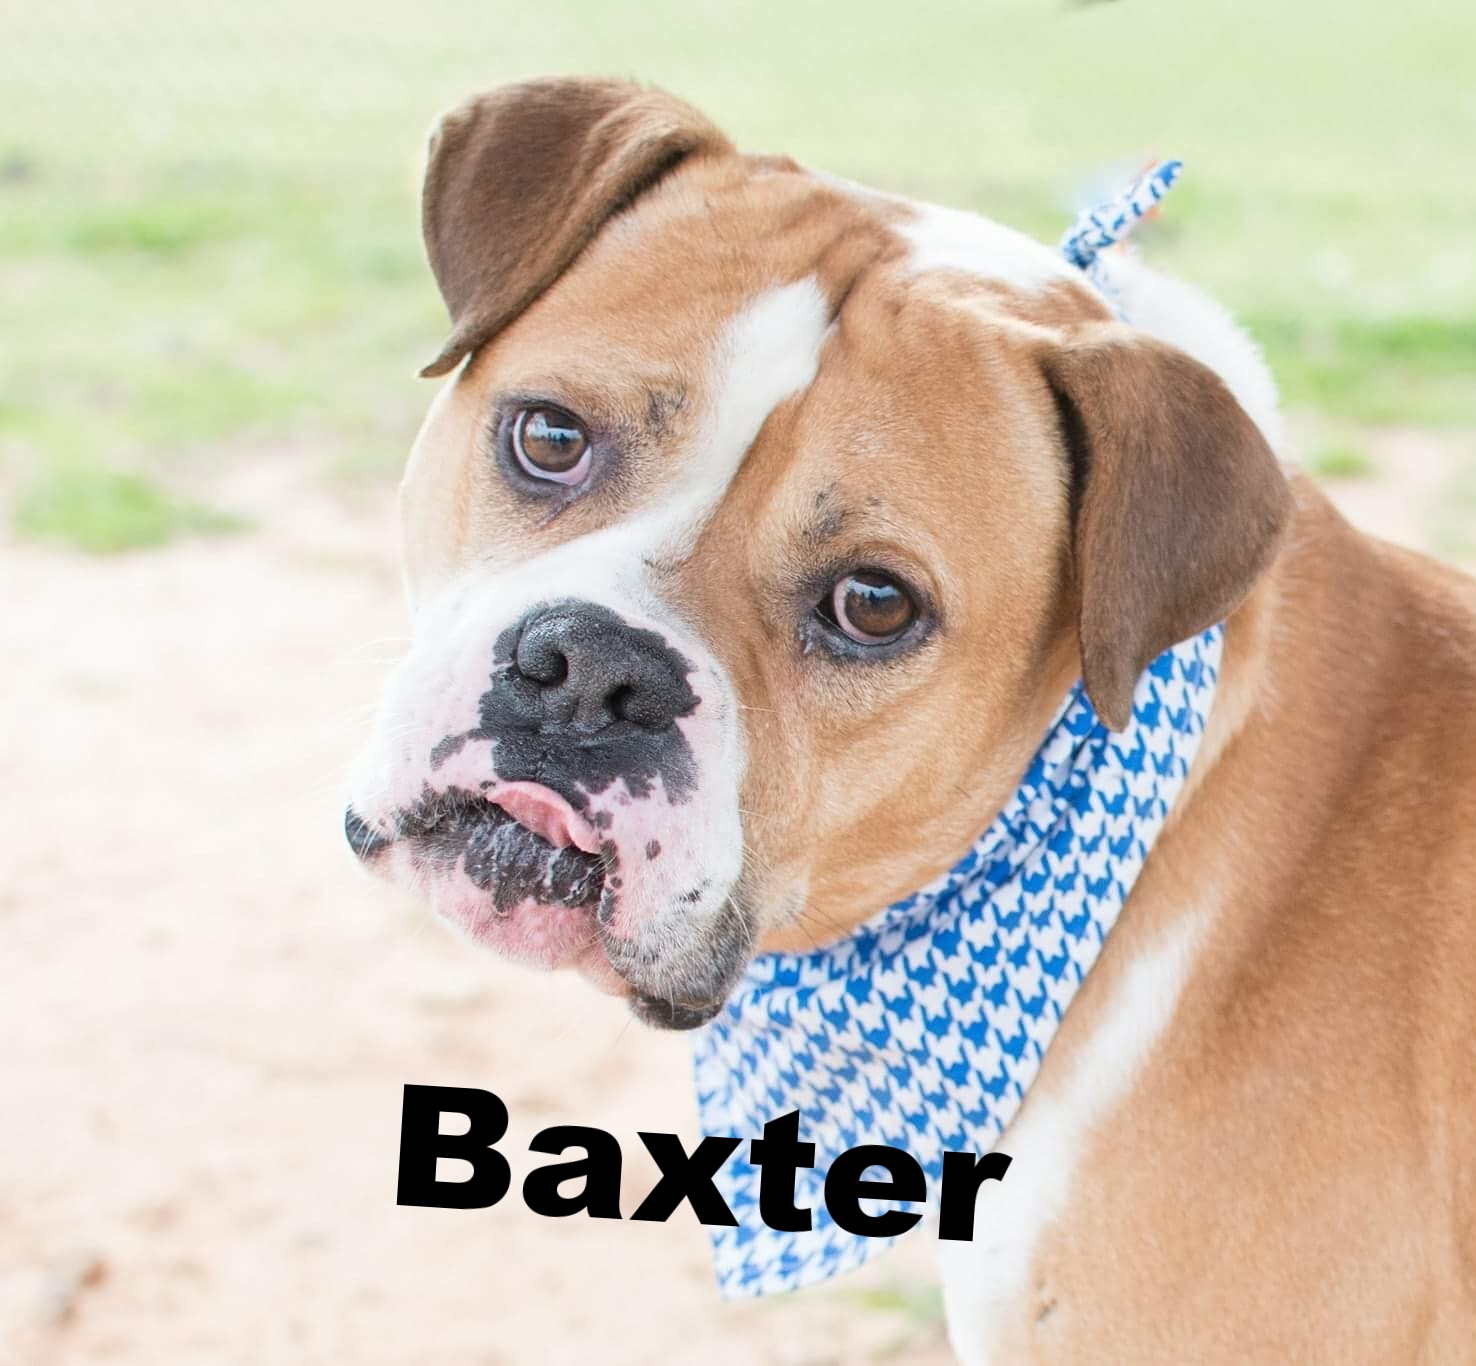 Baxter.jpeg